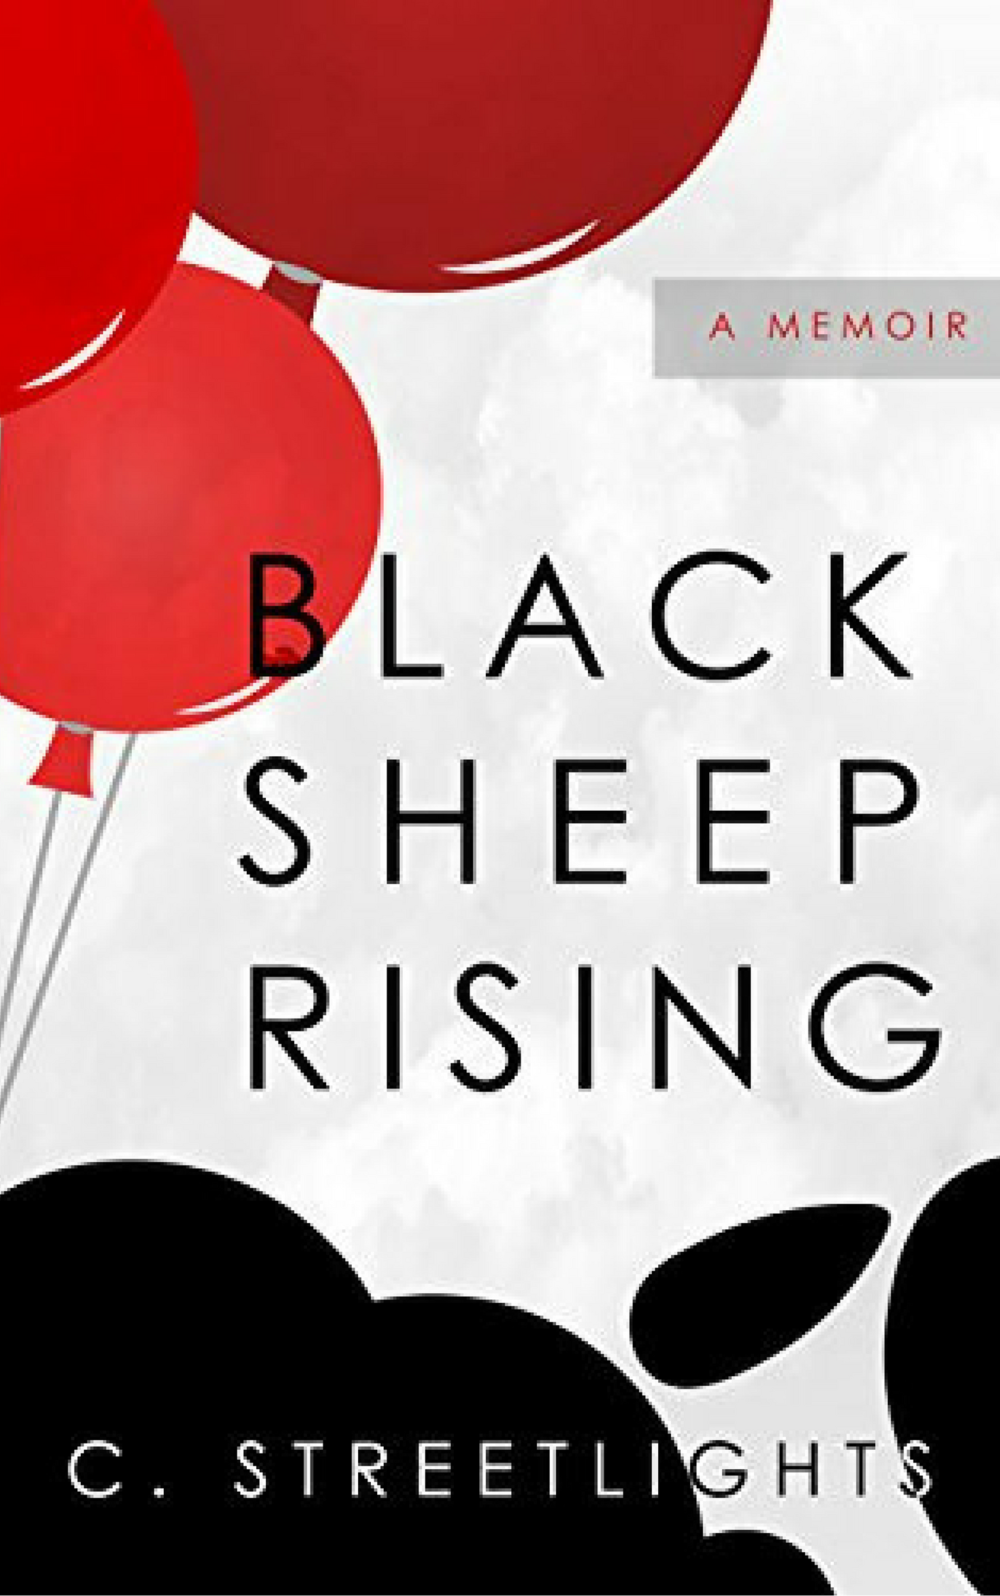 Black-Sheep-Rising.jpg